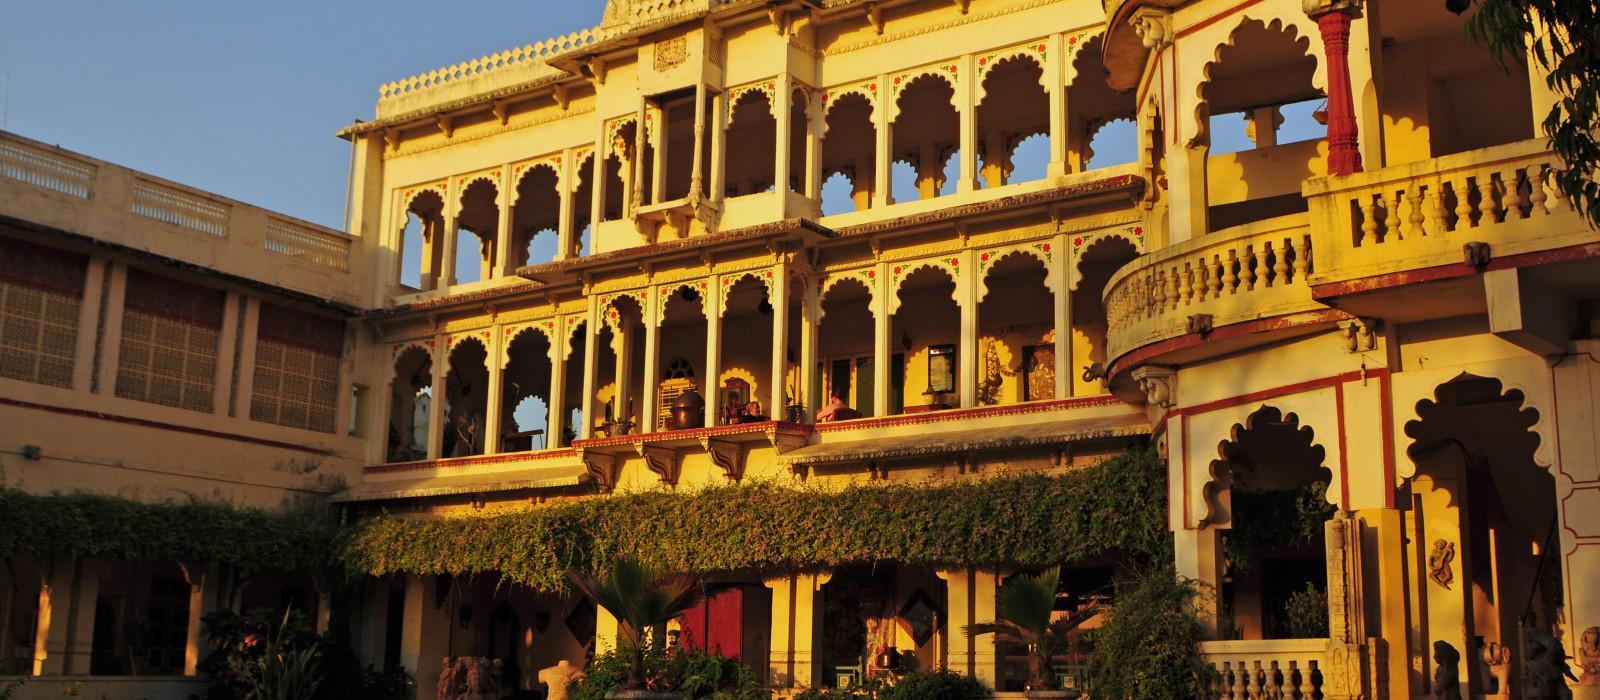 Destination Poshina Central & West India